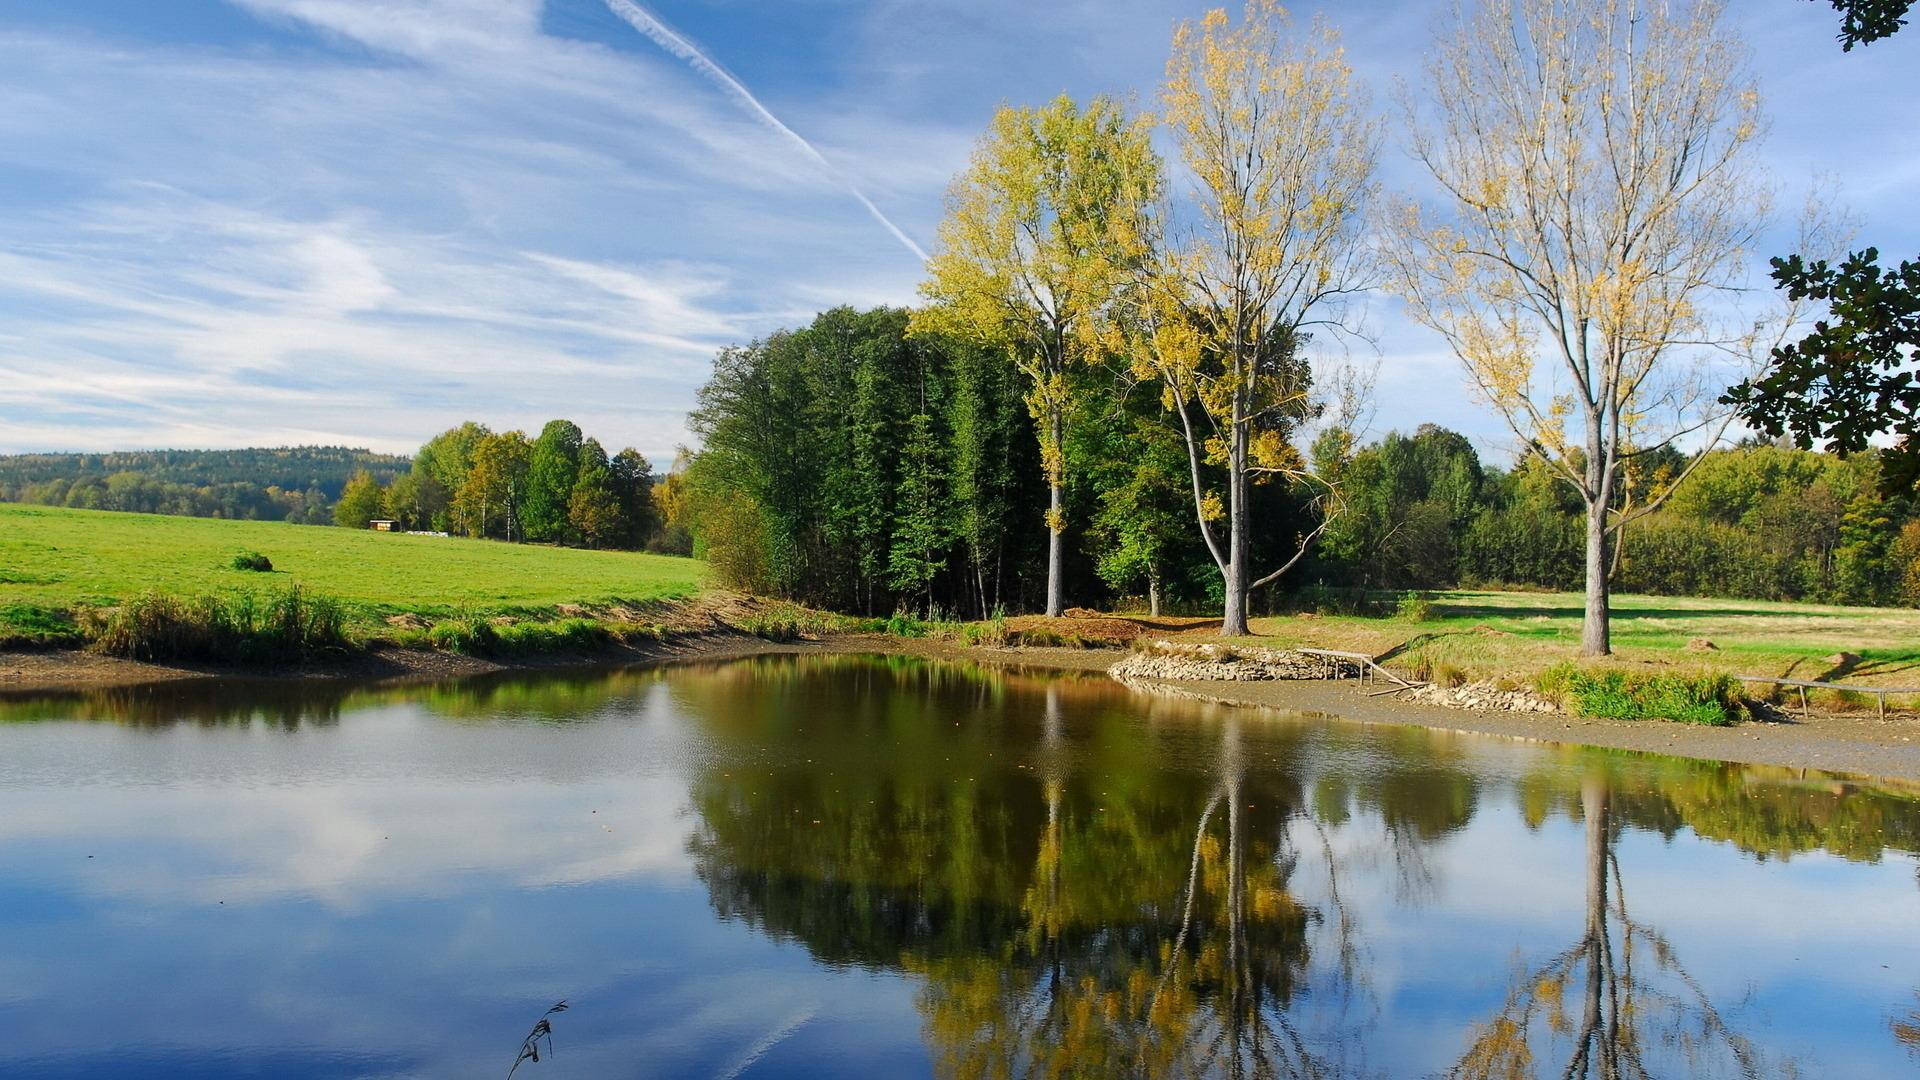 природа деревья небо река дома  № 571475 бесплатно